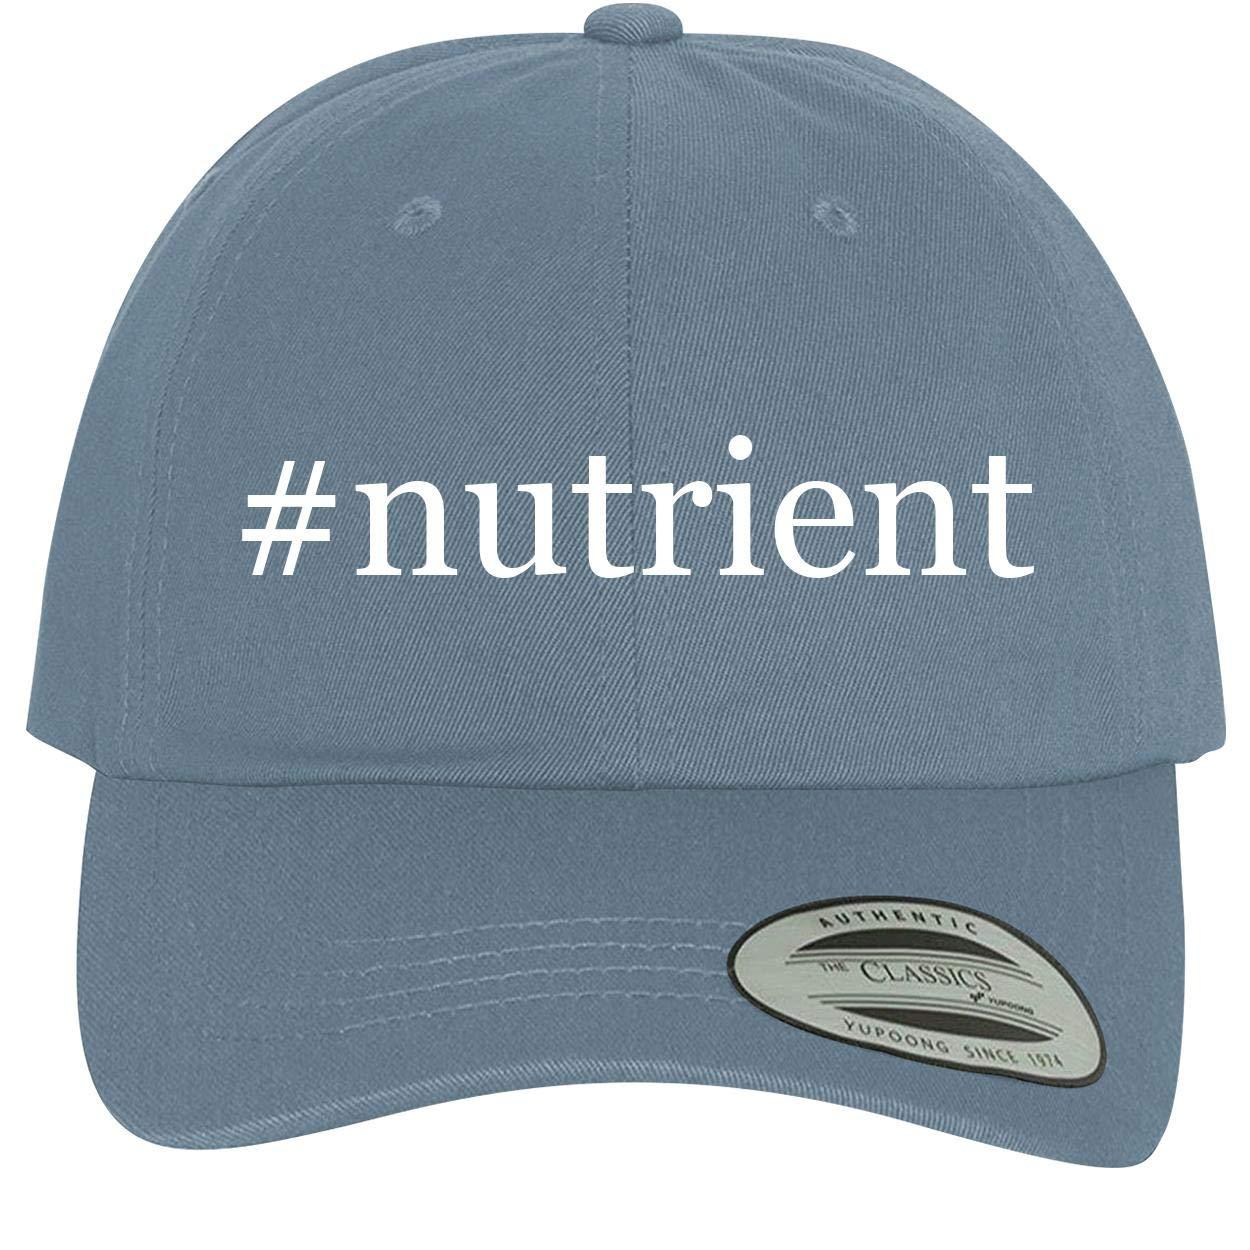 BH Cool Designs #Nutrient Comfortable Dad Hat Baseball Cap